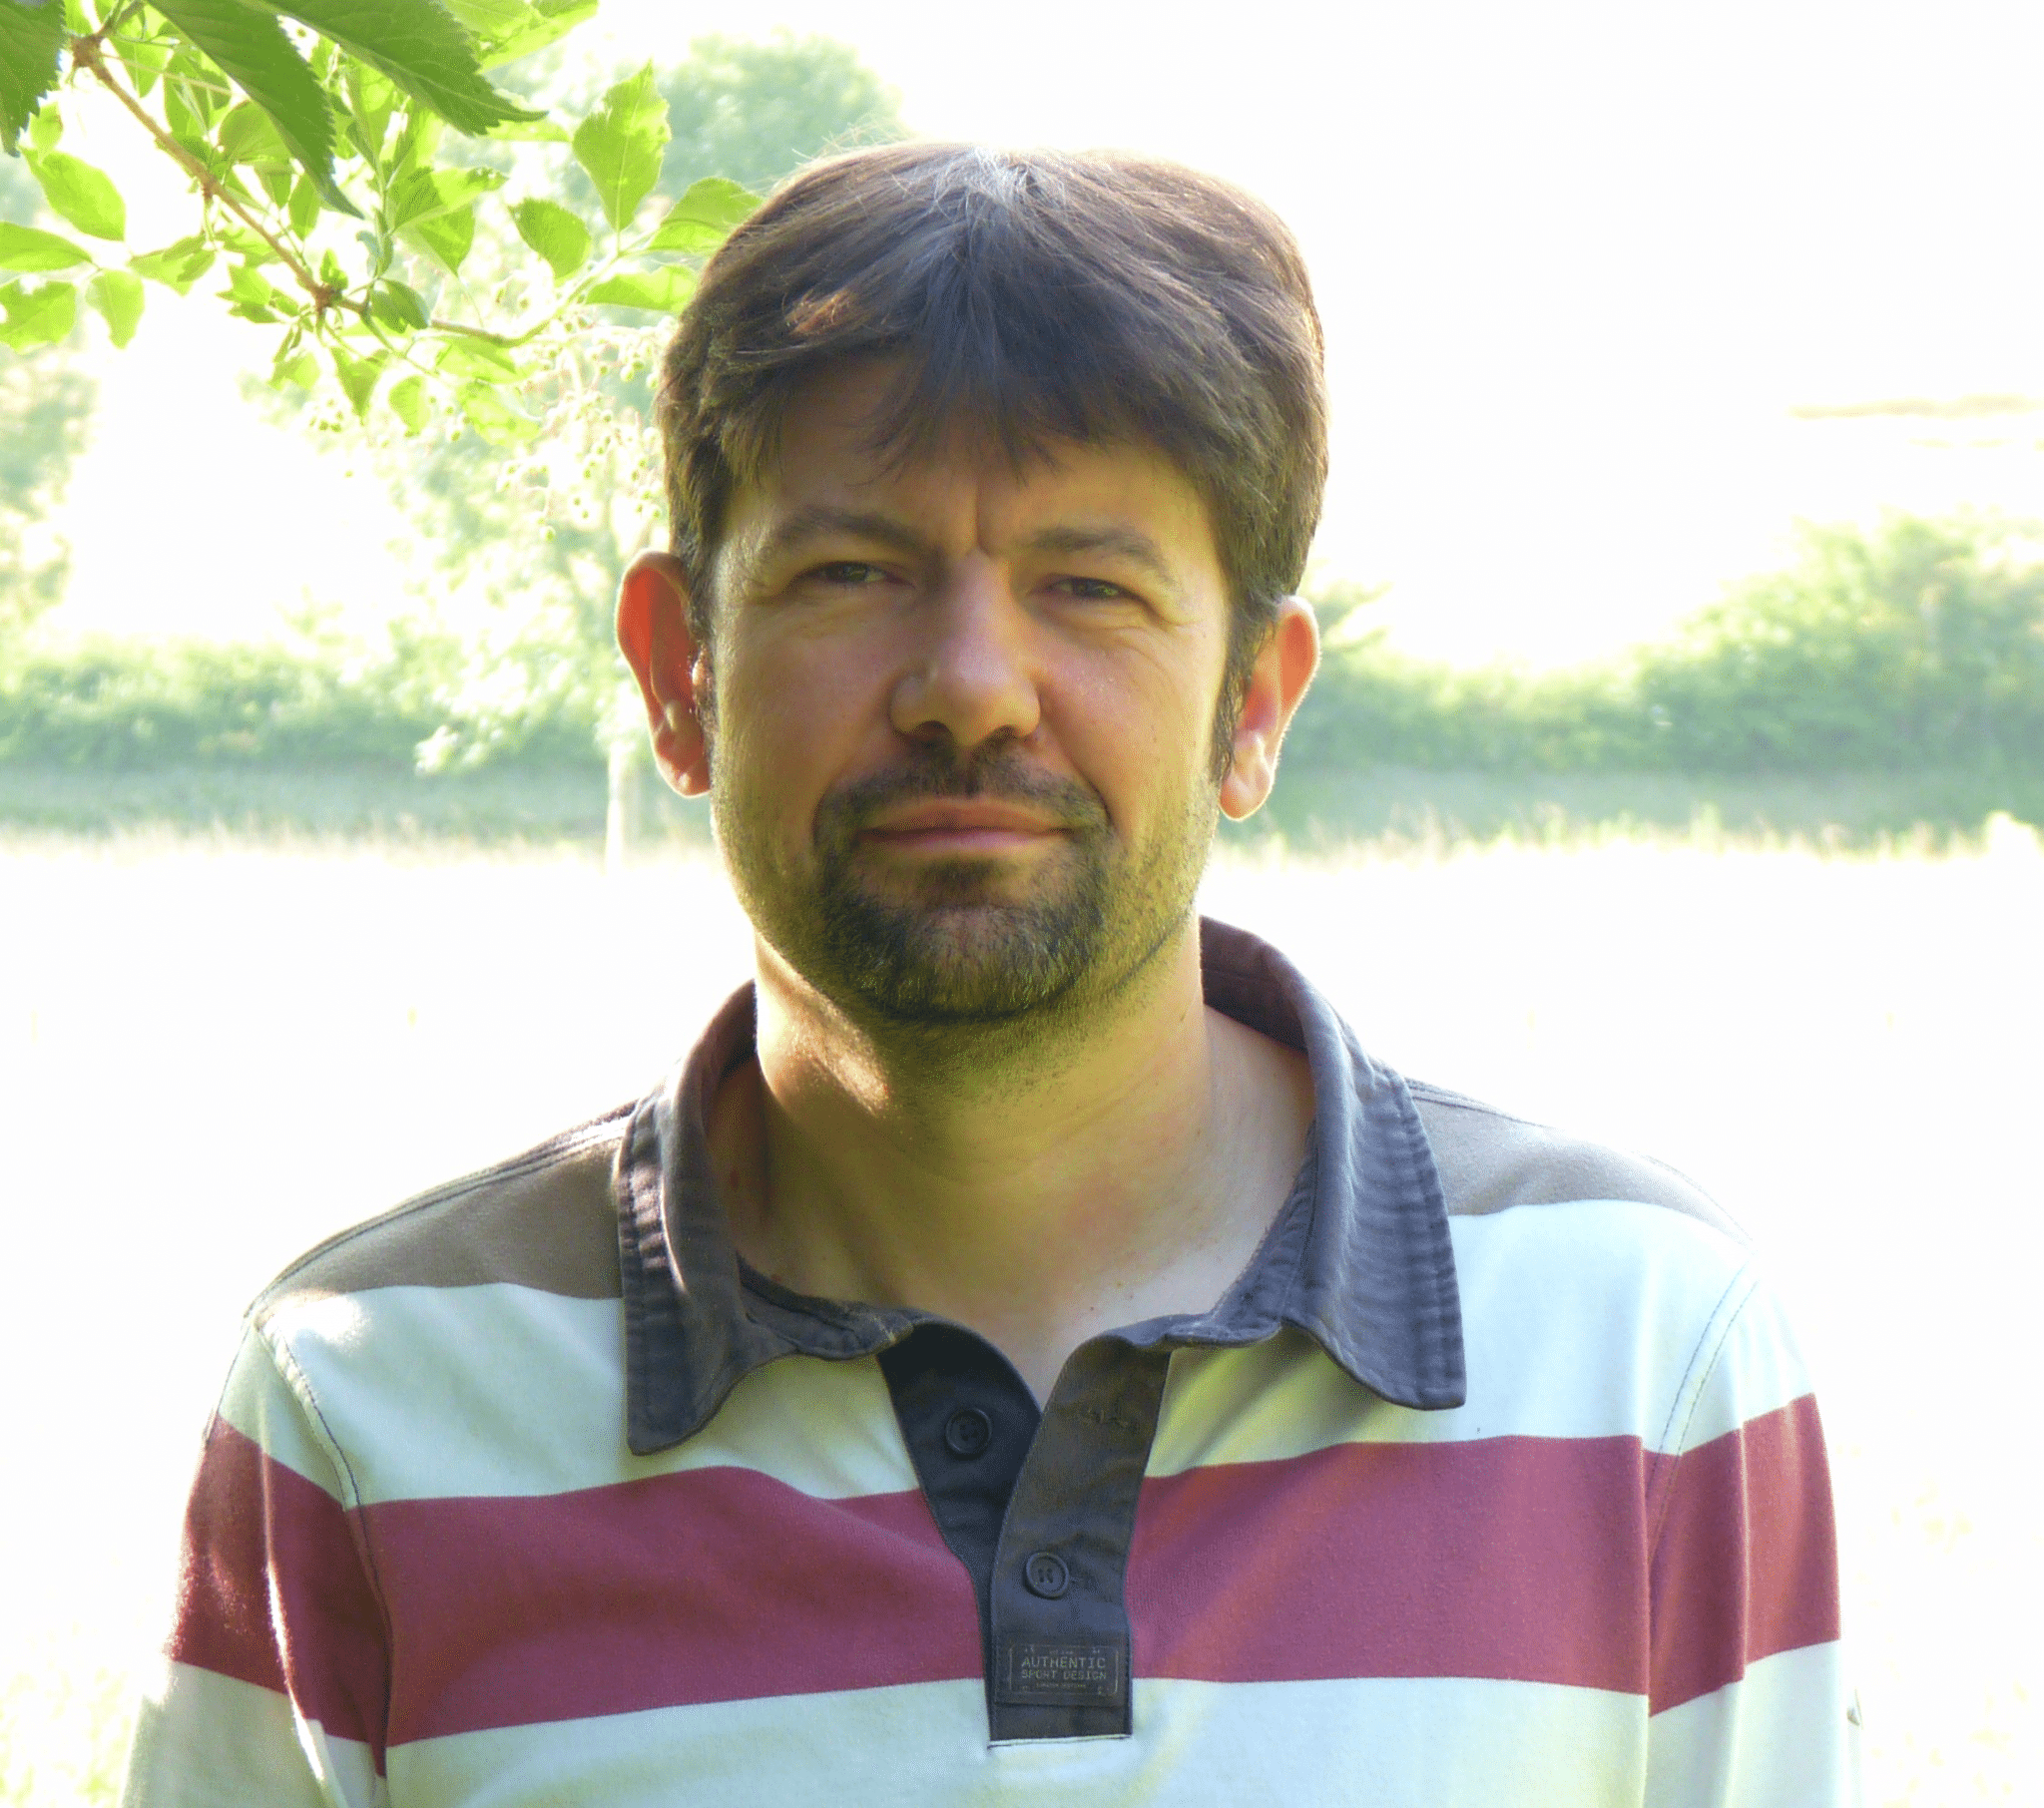 Quentin Delachapelle